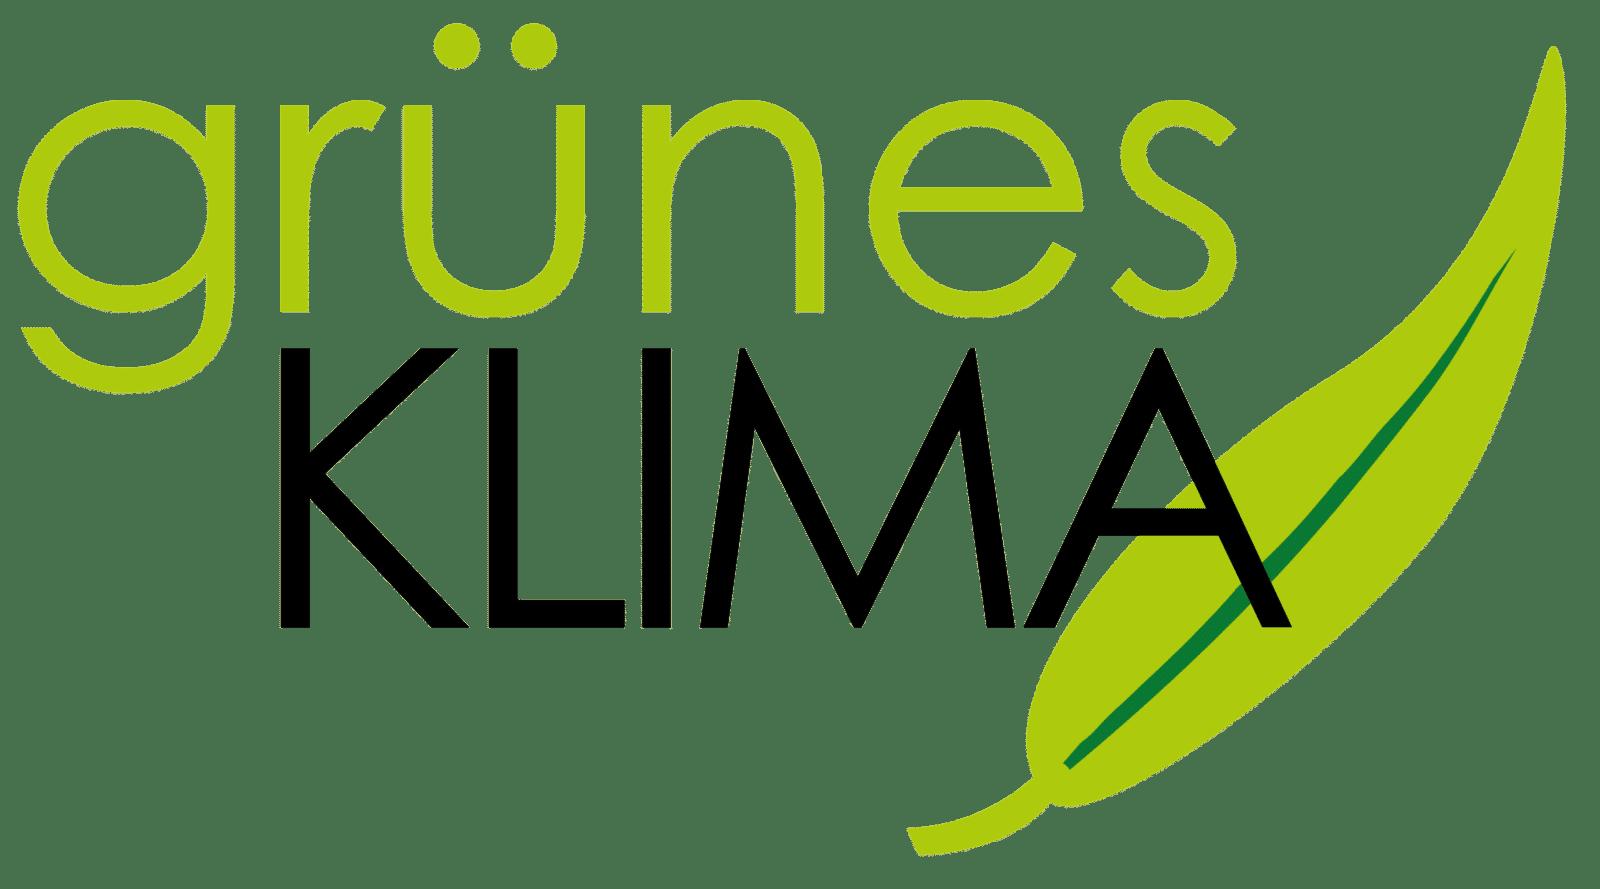 grunes klima logo